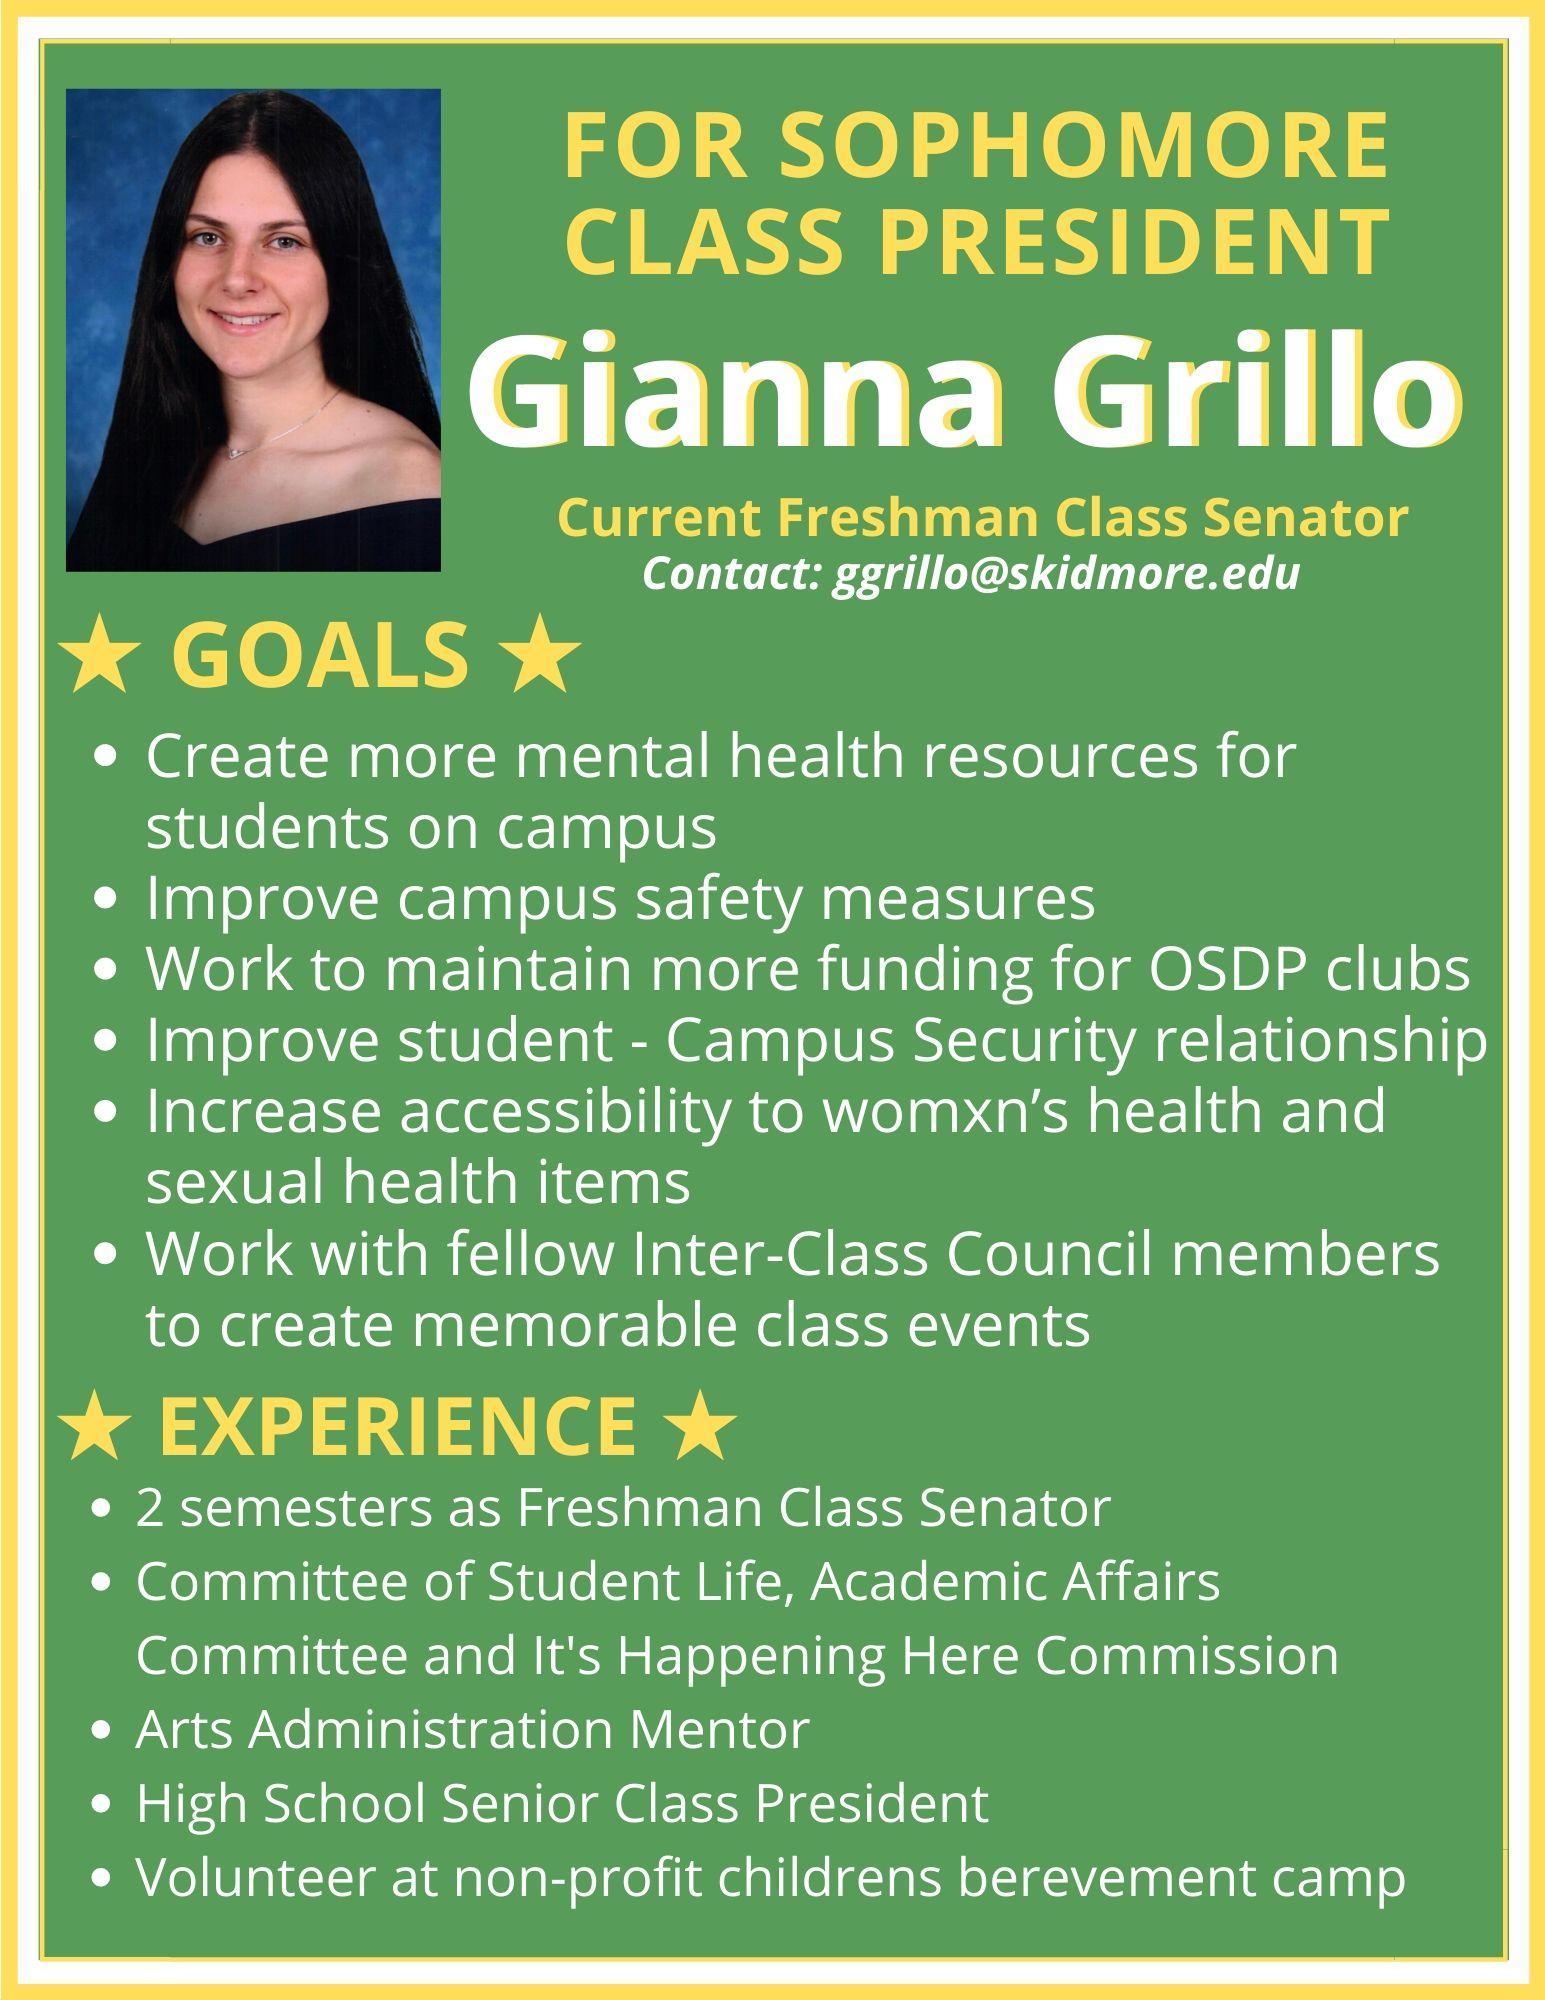 Gianna%20Grillo%20for%20Sophomore%20Class%20President